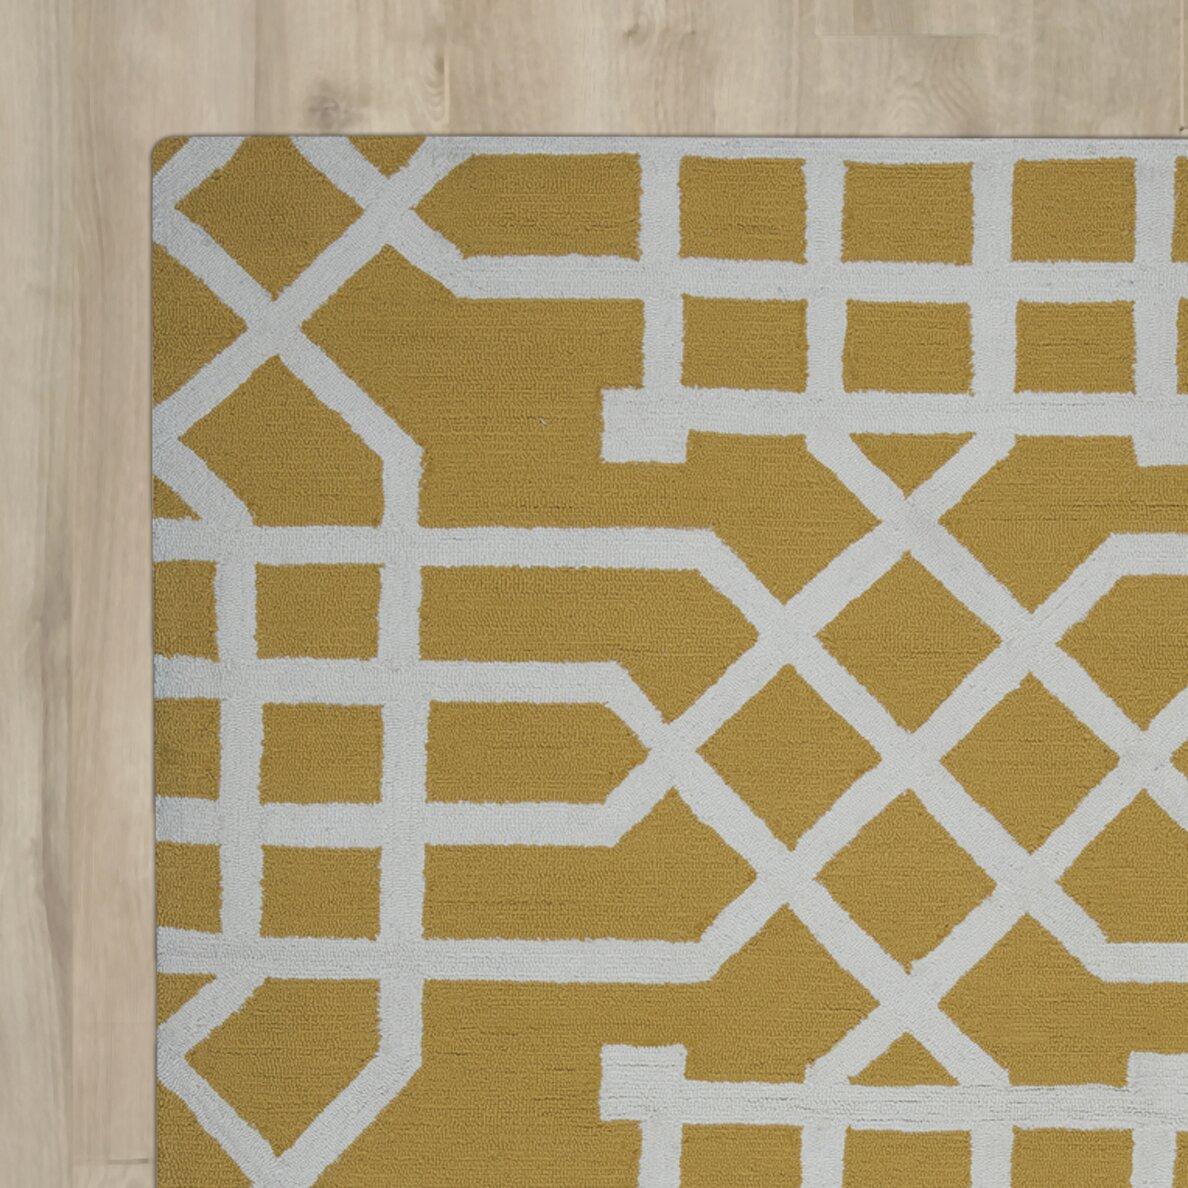 mercer41 angela hand tufted yellow white indoor outdoor area rug wayfair. Black Bedroom Furniture Sets. Home Design Ideas